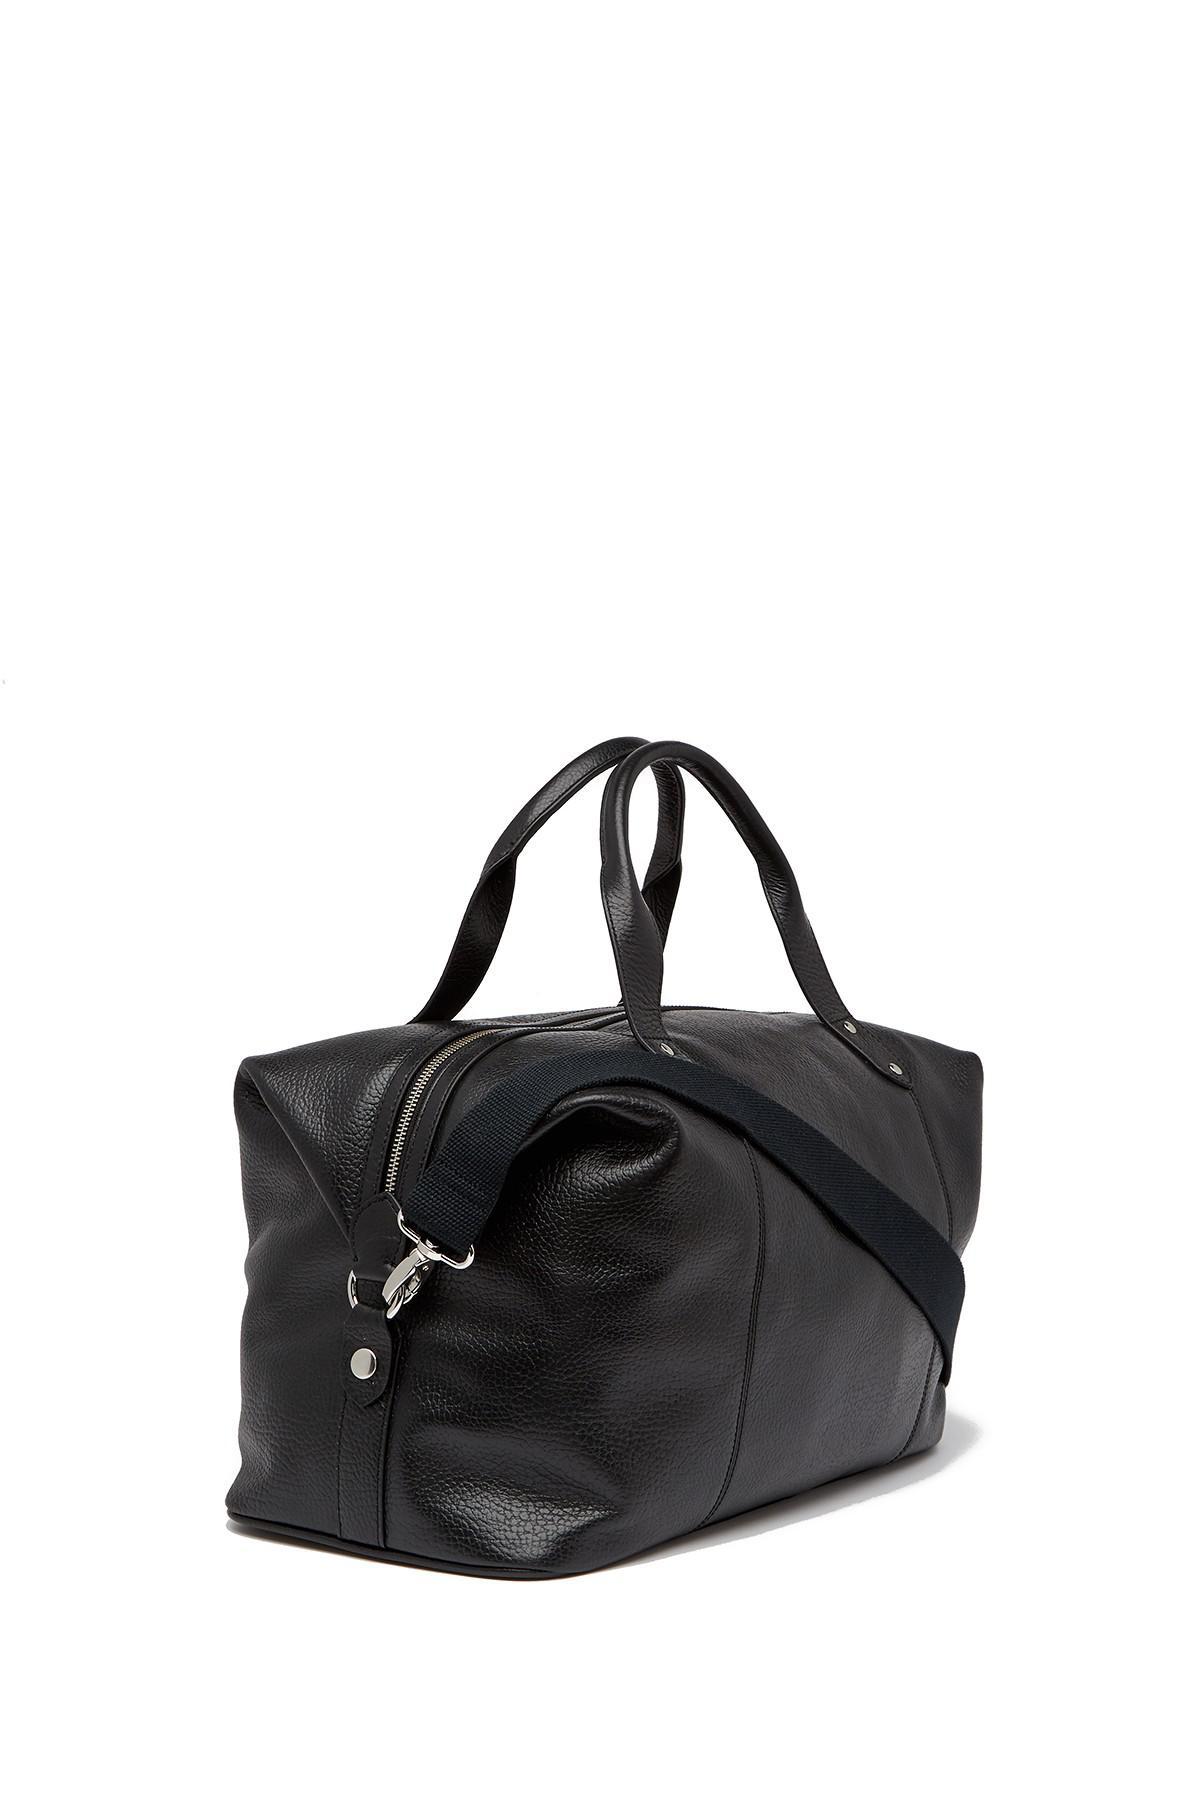 Cole Haan - Black Saunders Leather Duffel Bag for Men - Lyst. View  fullscreen 46ec99d06ed10